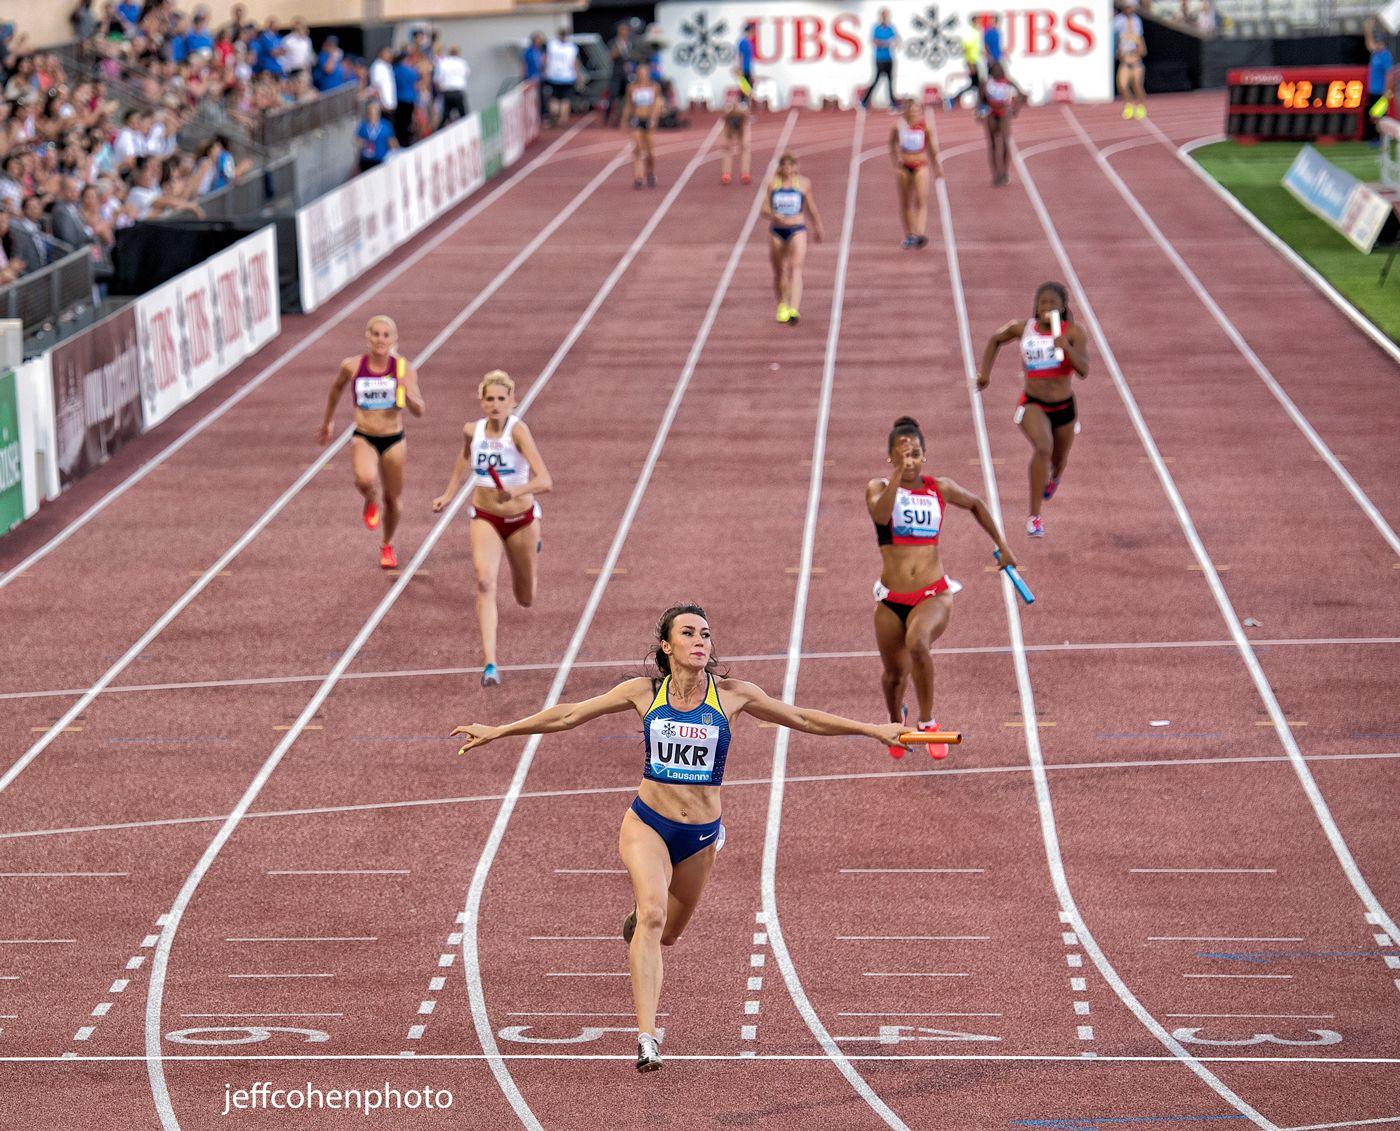 1r2016_athletissima_lausanne_ukraine_4x100w_jeff_cohen_photo_731_web.jpg